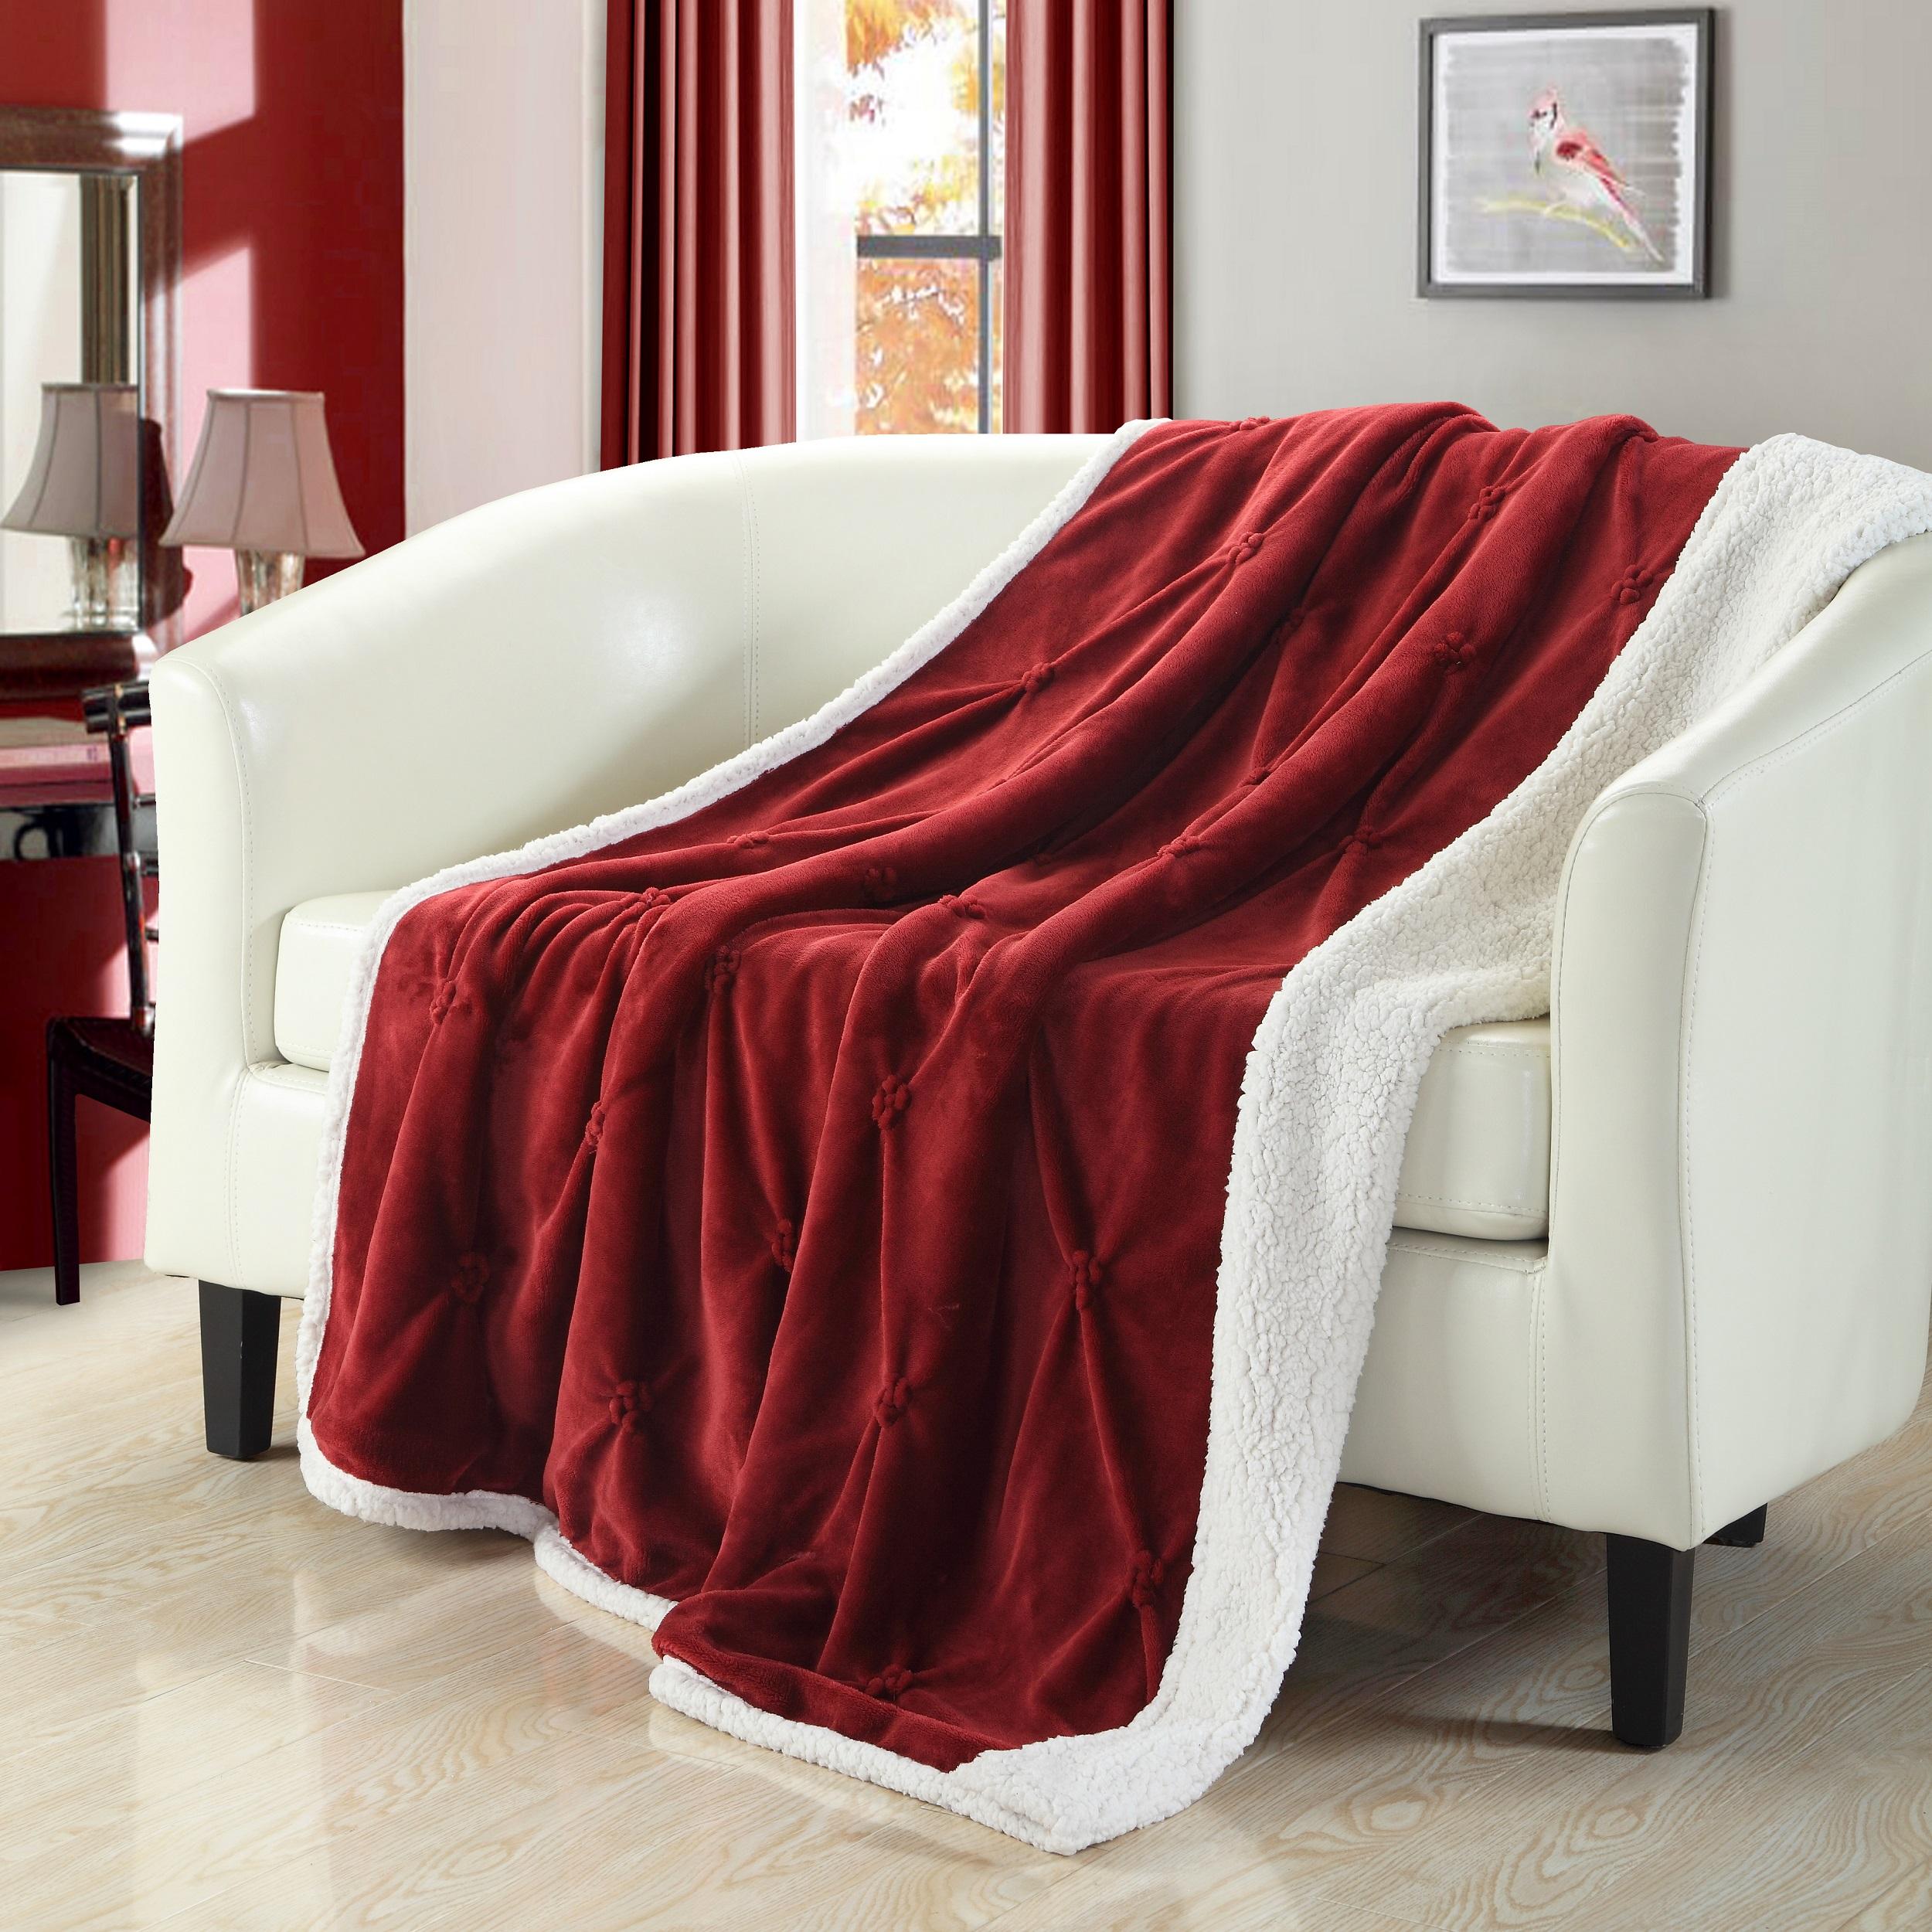 Chic Home 1-Piece Barbuda Pinch Pleated Throw Blanket Sherpa Blanket